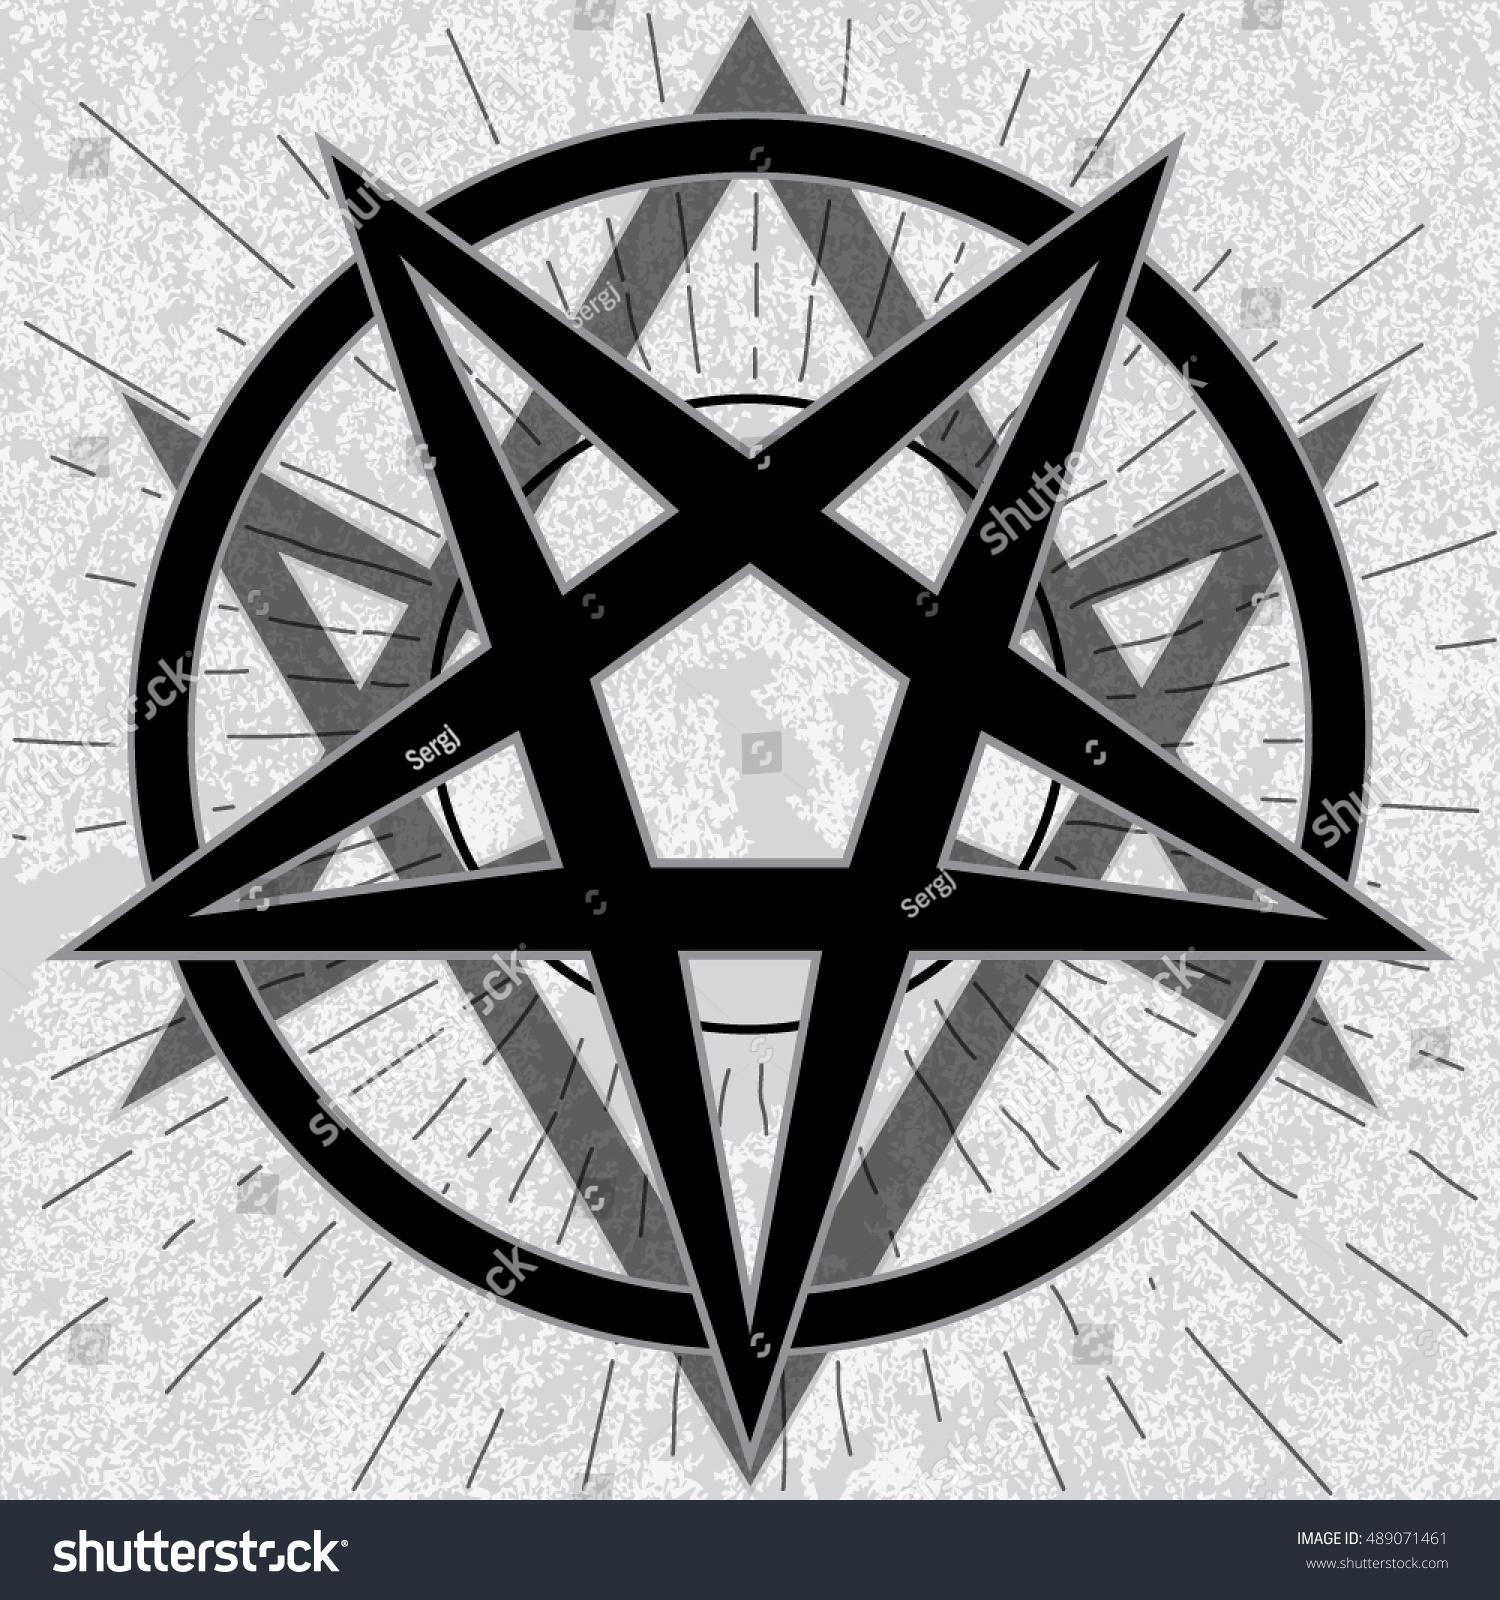 Baphomet sign thelema hexagram stylish pentagram stock vector baphomet sign with thelema hexagram stylish pentagram with thelema sigil on grunge background and star biocorpaavc Choice Image